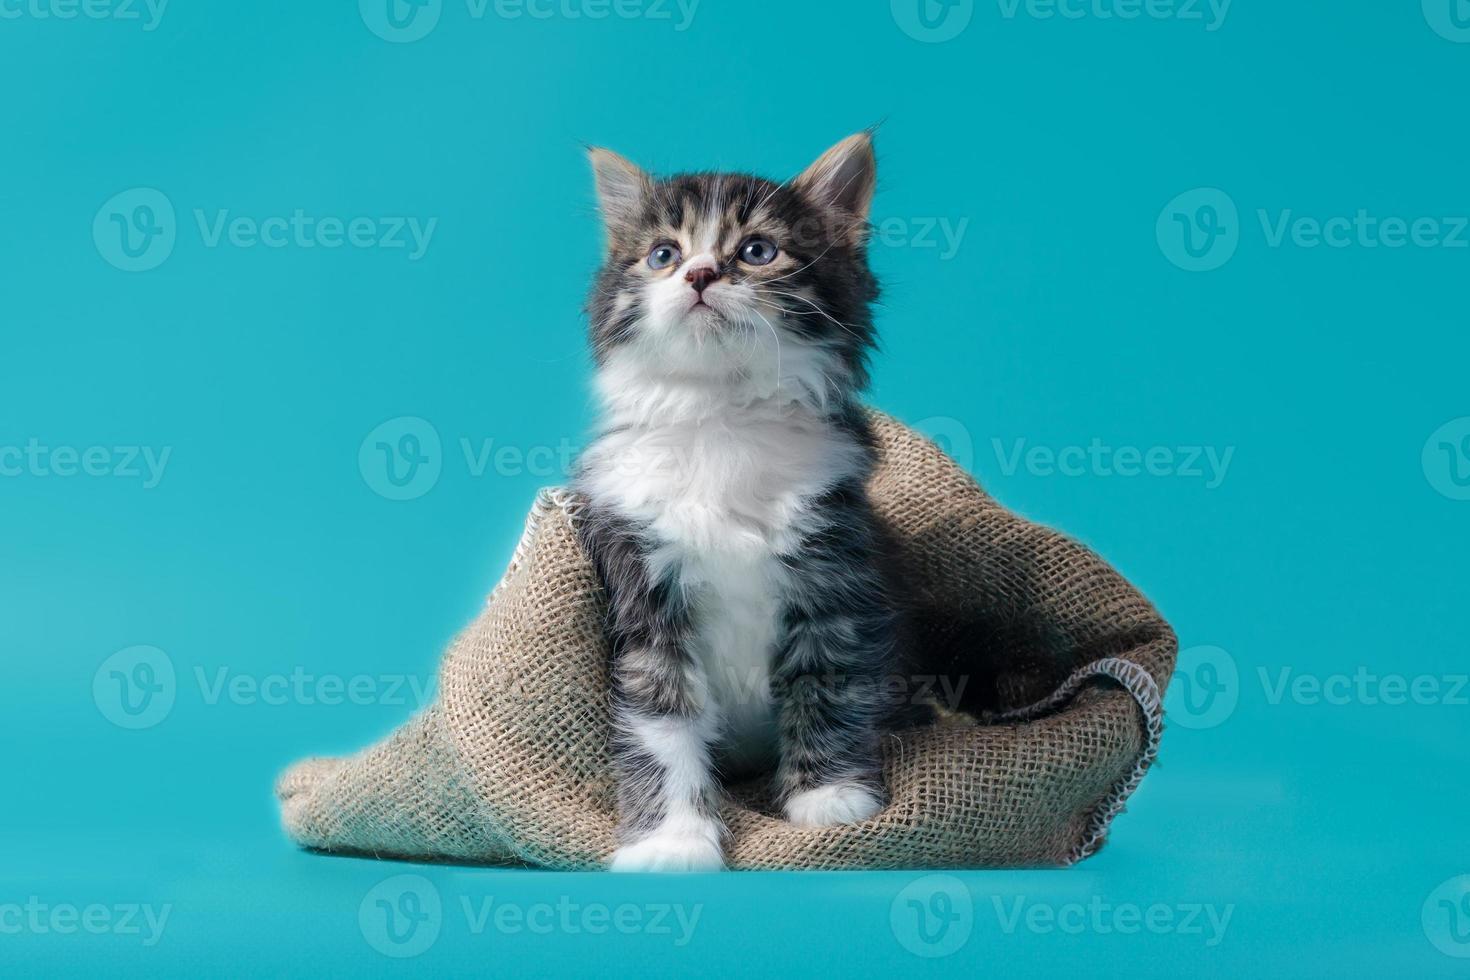 Gatito atigrado con saco sobre un fondo turquesa foto